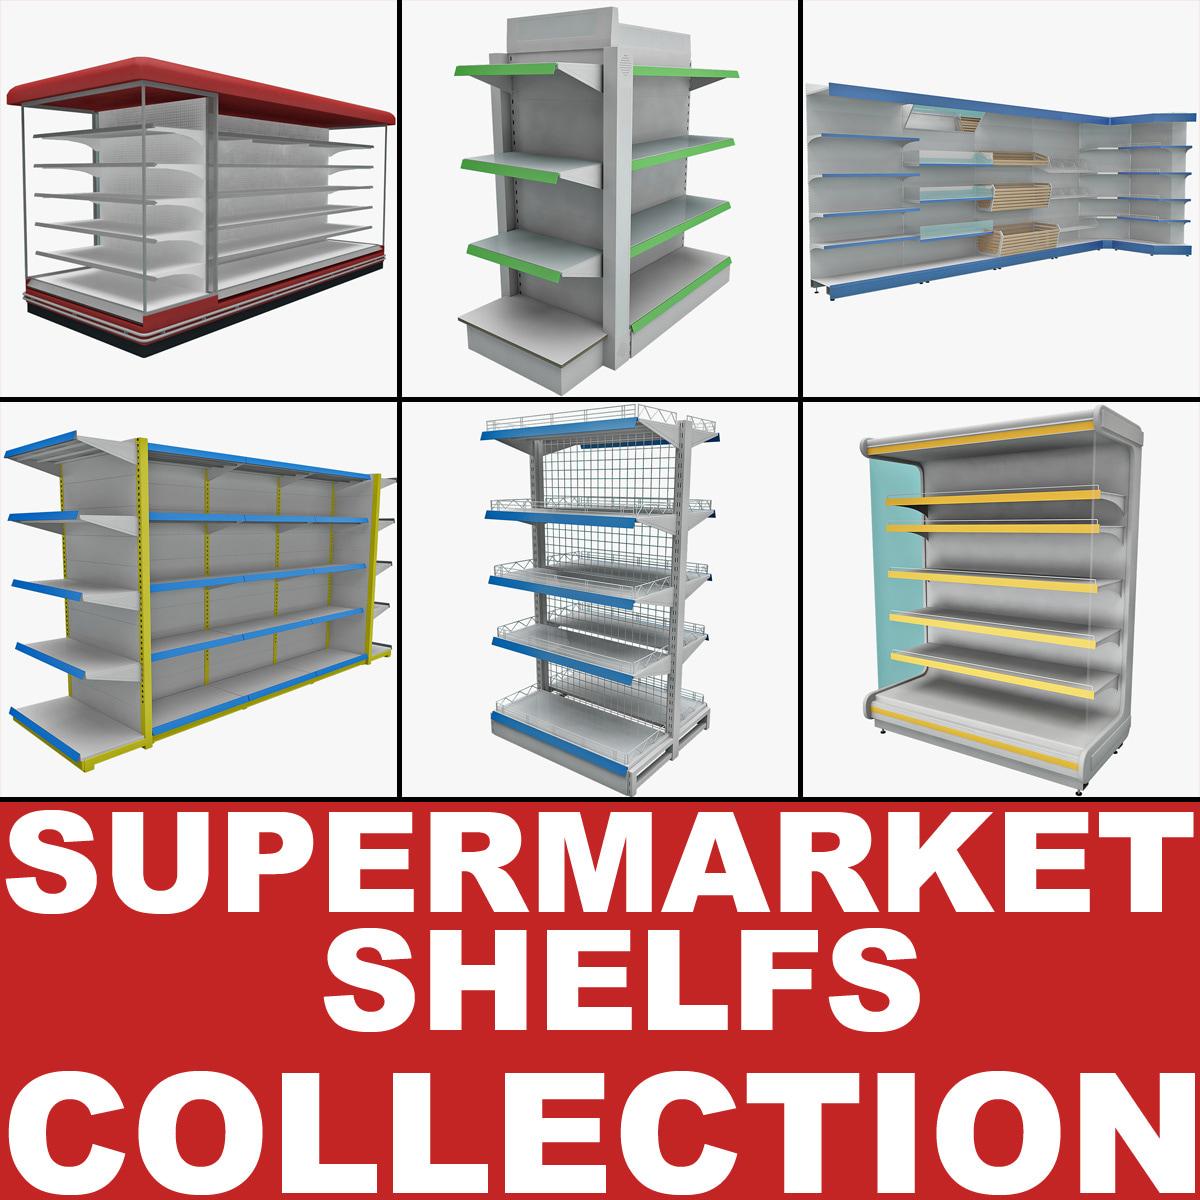 Supermarket Shelfs Collection 2